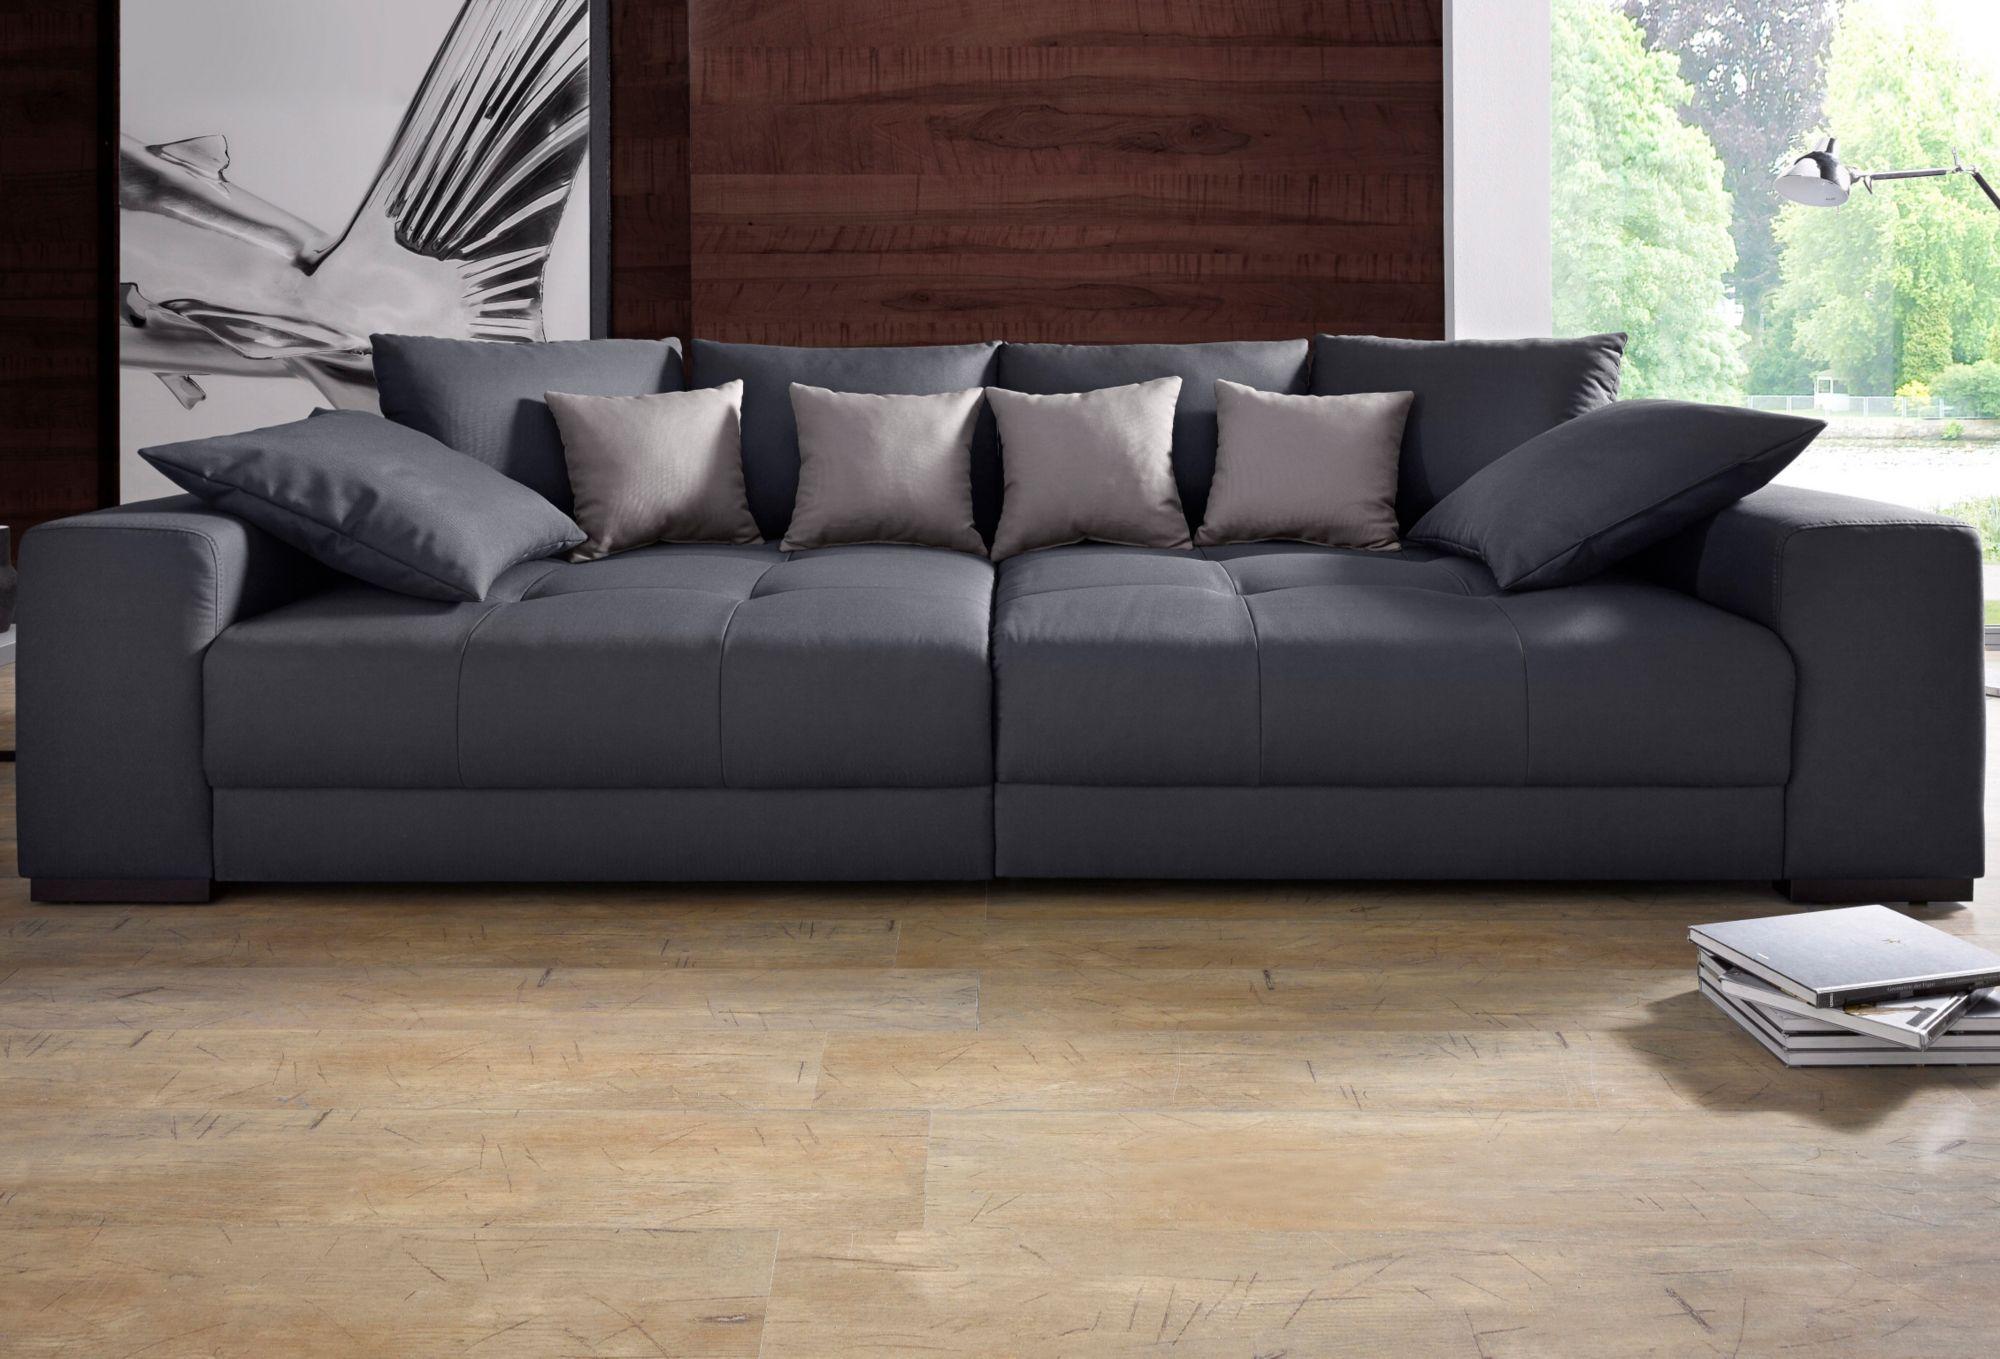 Big Sofa Mit Boxspringunterfederung Schwab Versand Big Sofas